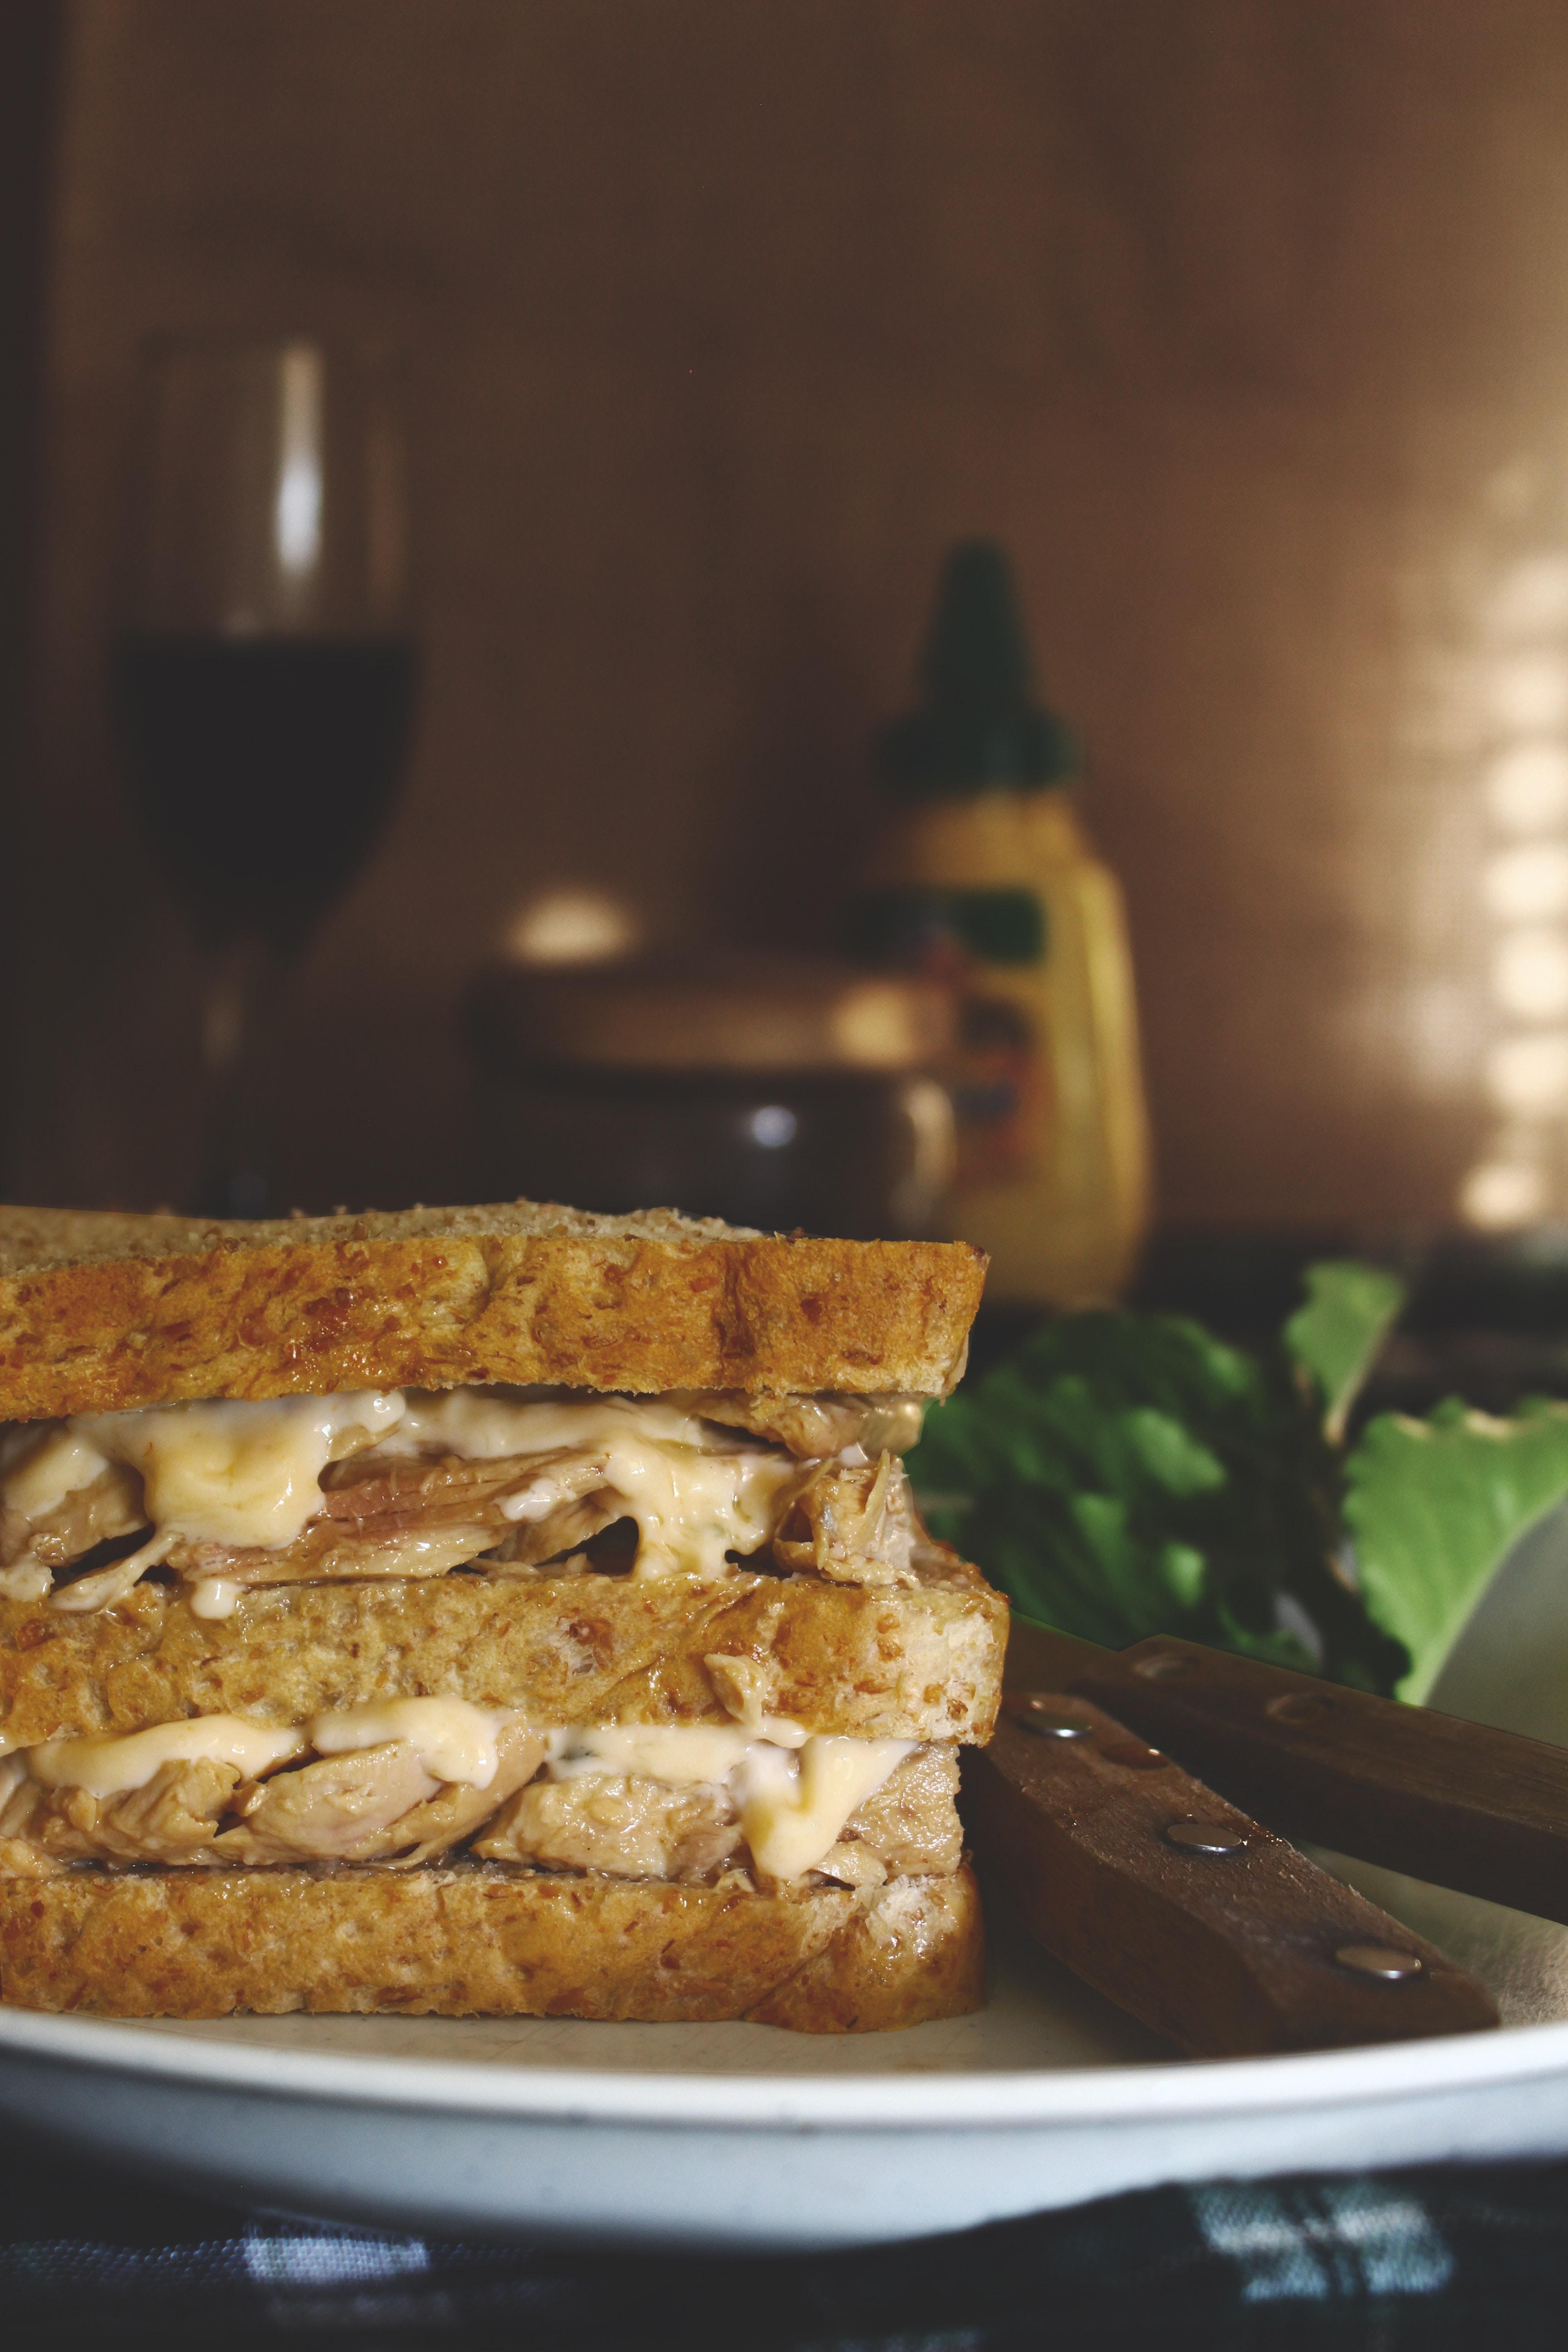 Baked Sandwich, Bread, Breakfast, Delicious, Focus, HQ Photo